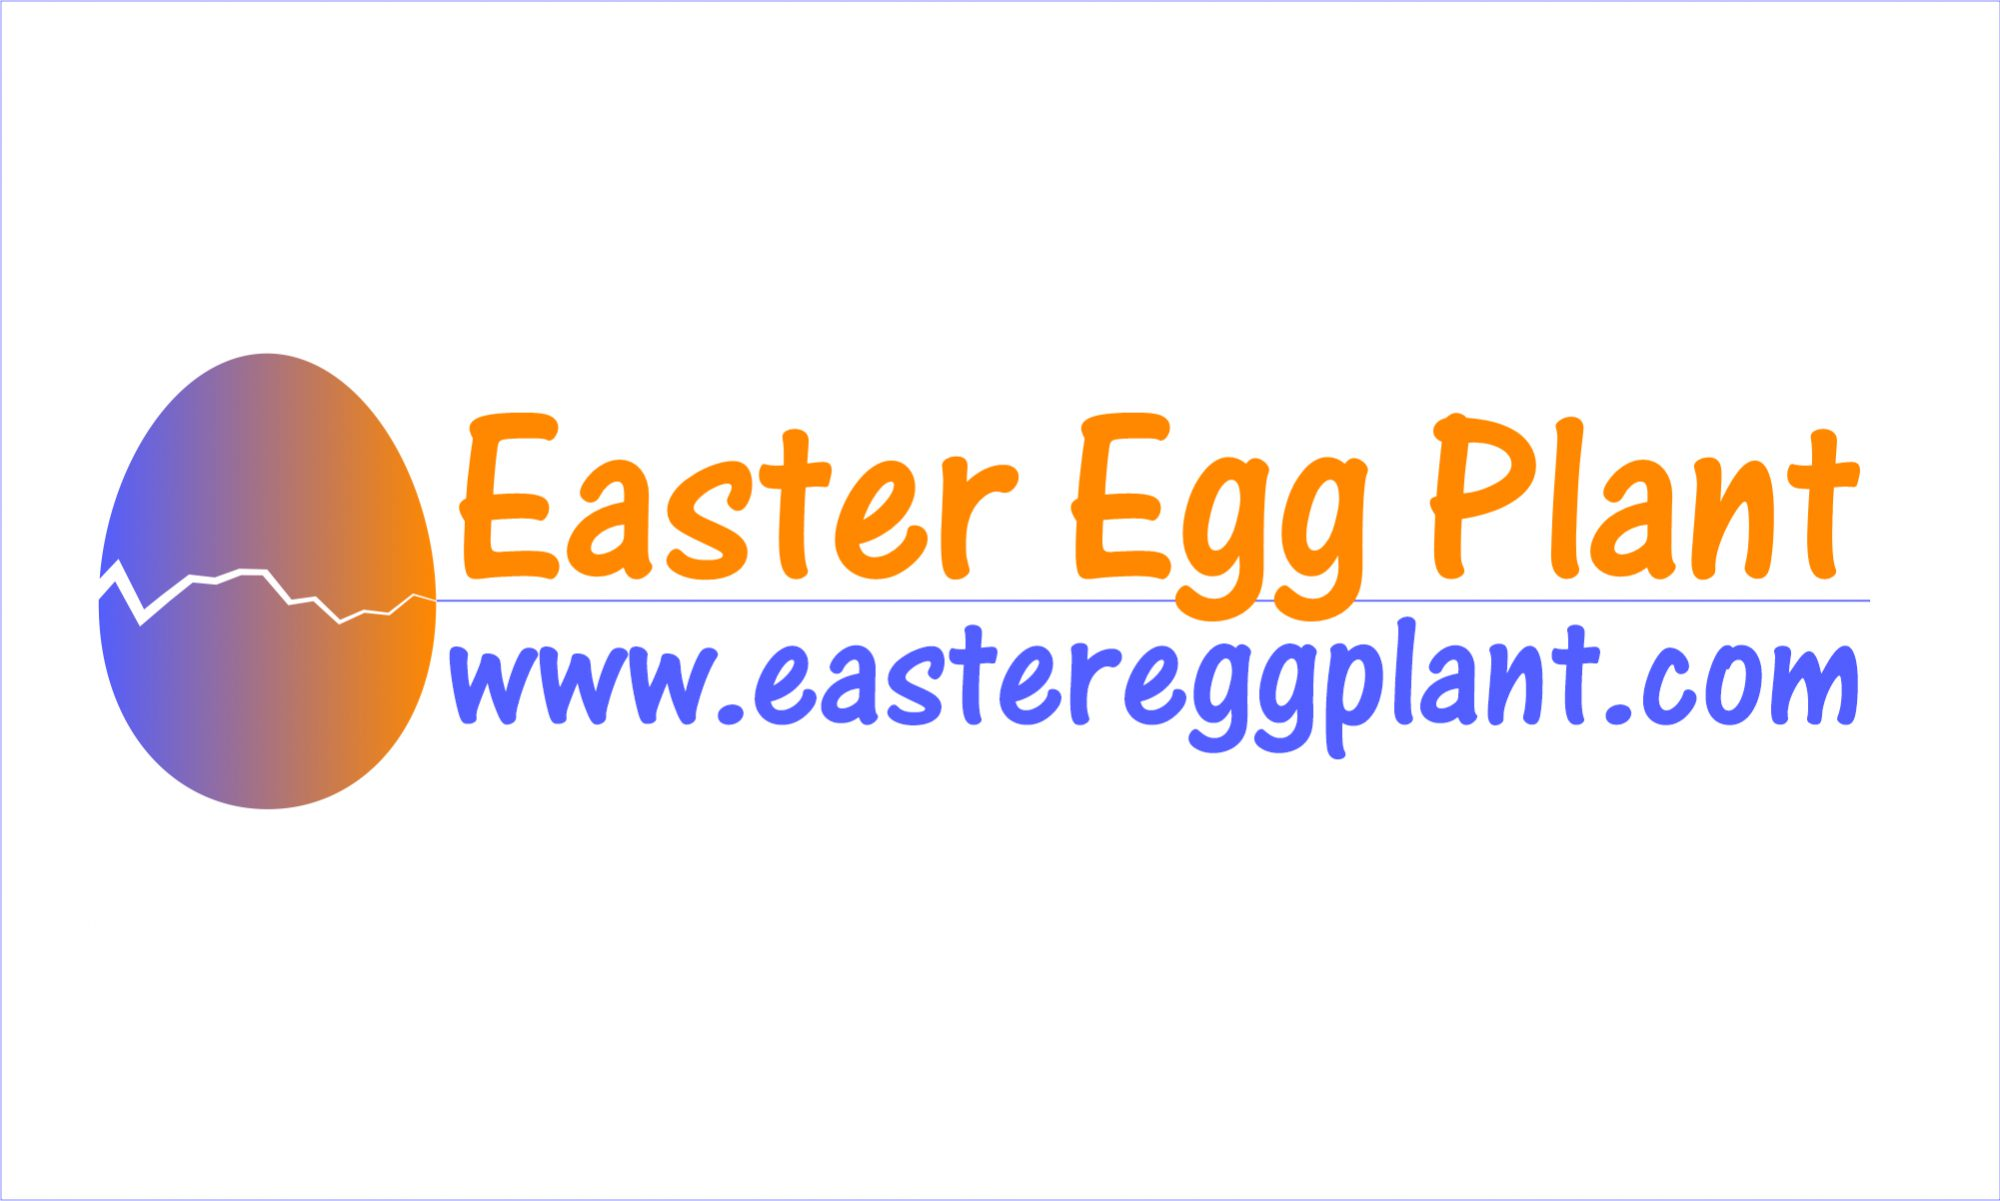 EasterEggPlant